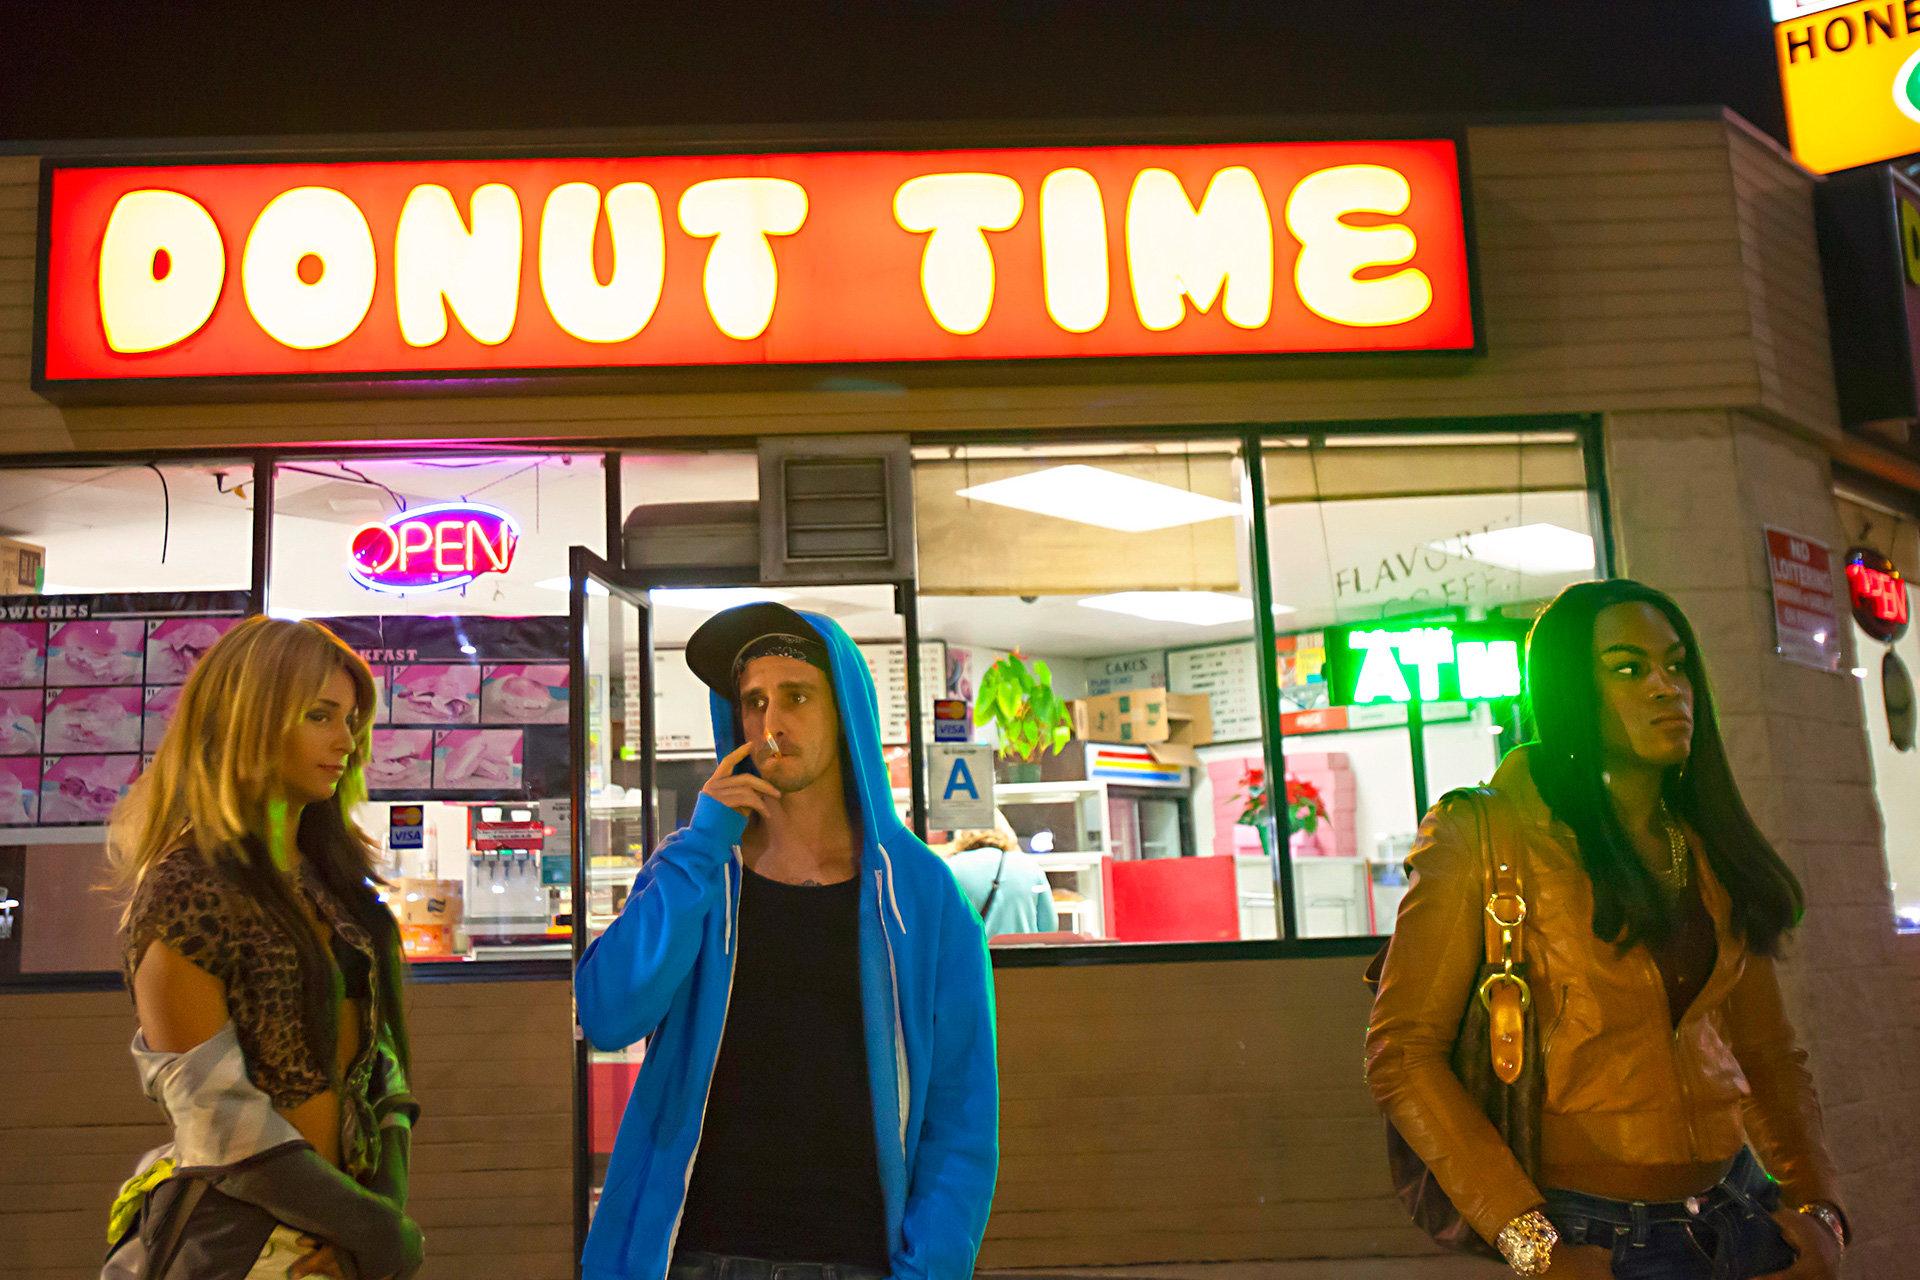 Kitana Kiki Rodriguez und Mya Taylor stehen vor dem Donut Shop